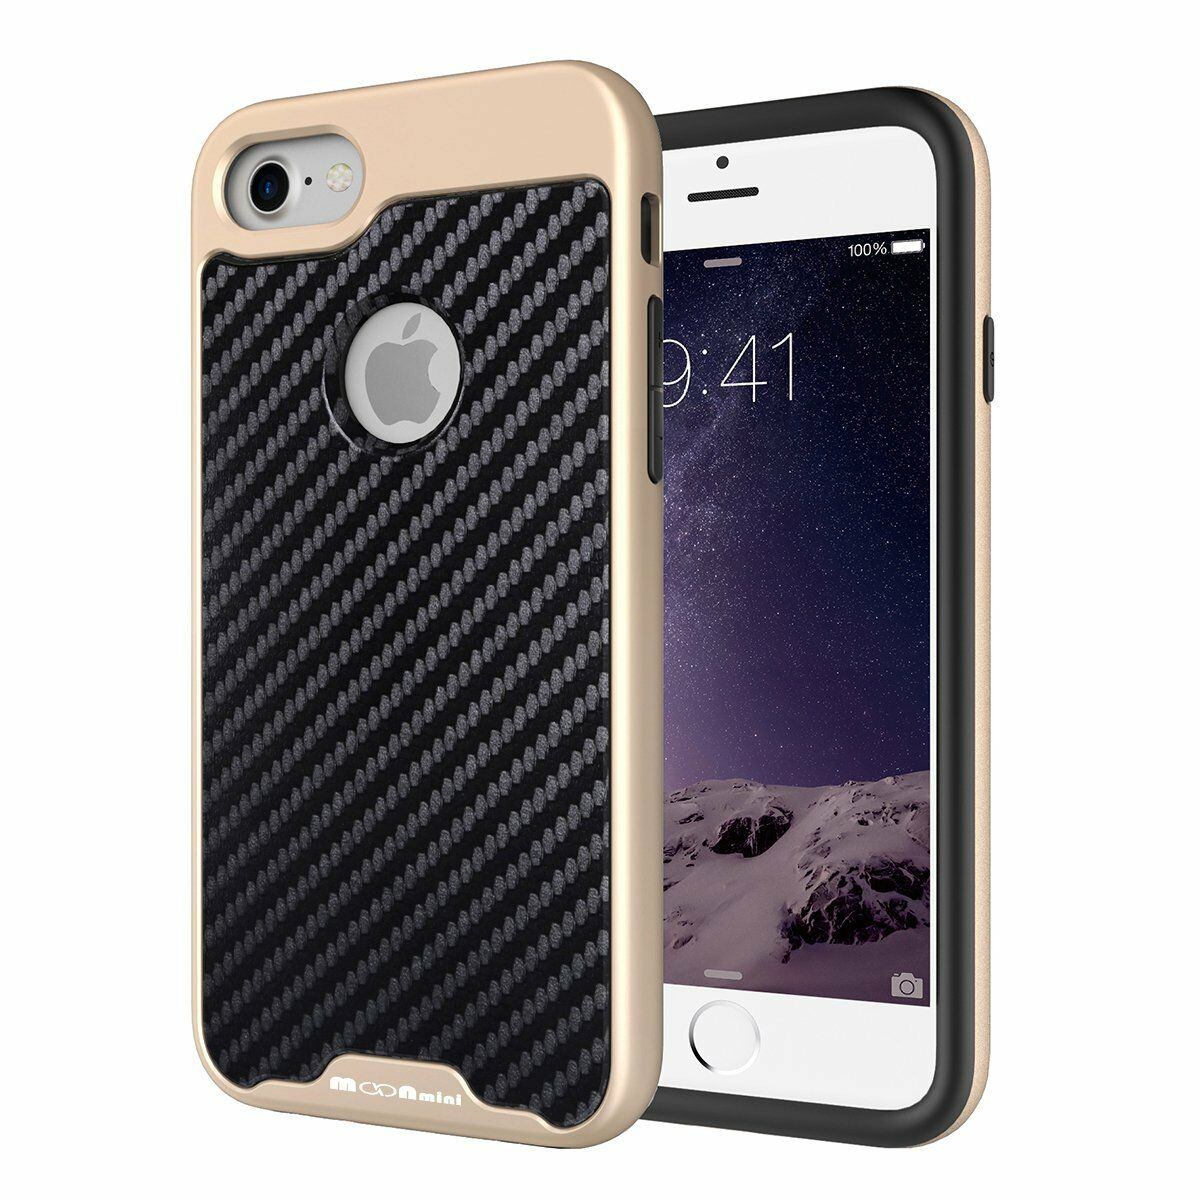 iPhone 7 Case Moonmini PU Leather Carbon Fiber Luxury Shockp